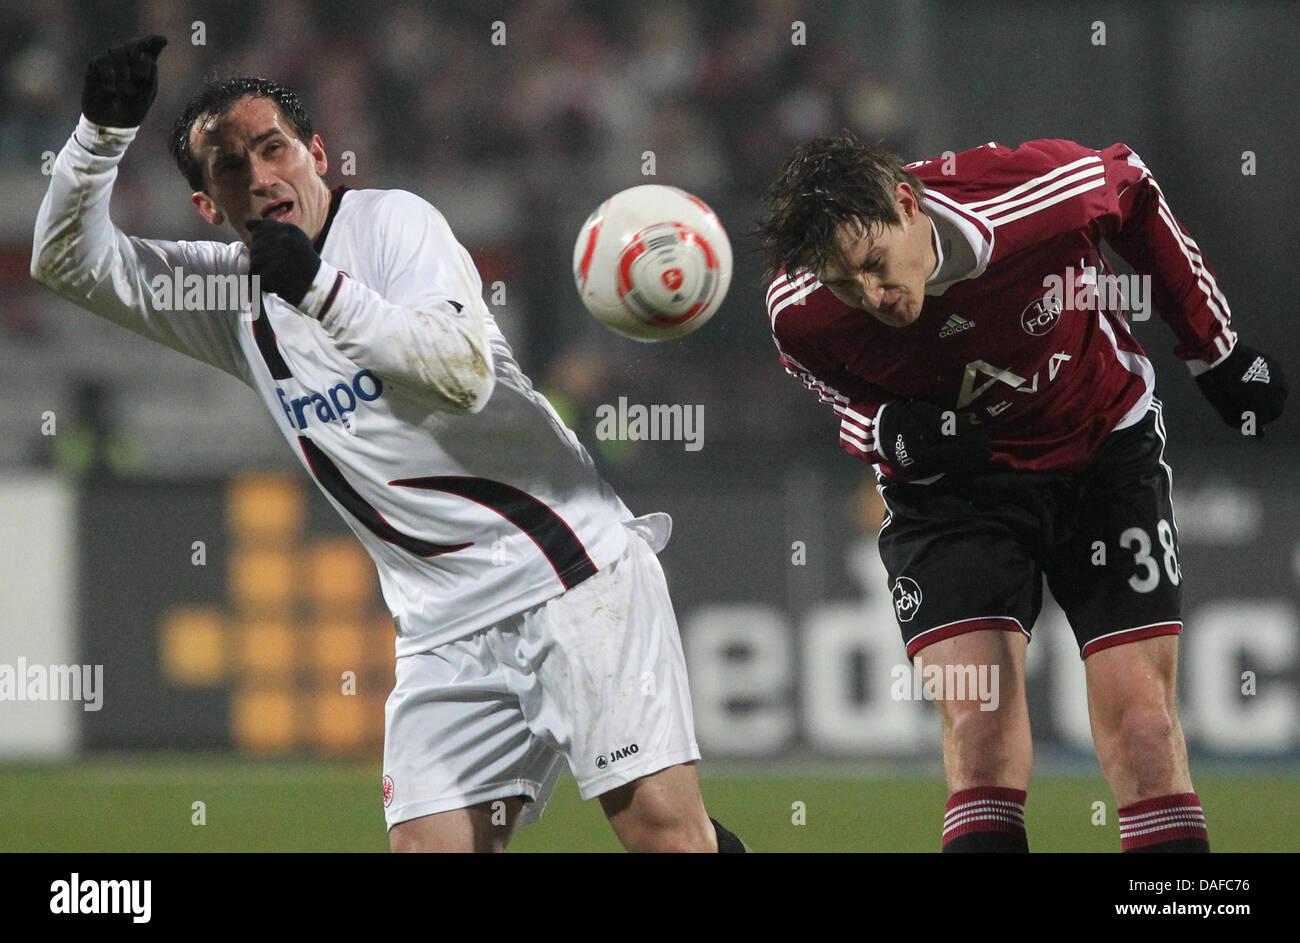 Nürnberger Philipp Wollscheid (R) und Frankfurts Theofanis Gekas Kampf um den Ball in der Bundesliga-Fußball Stockbild